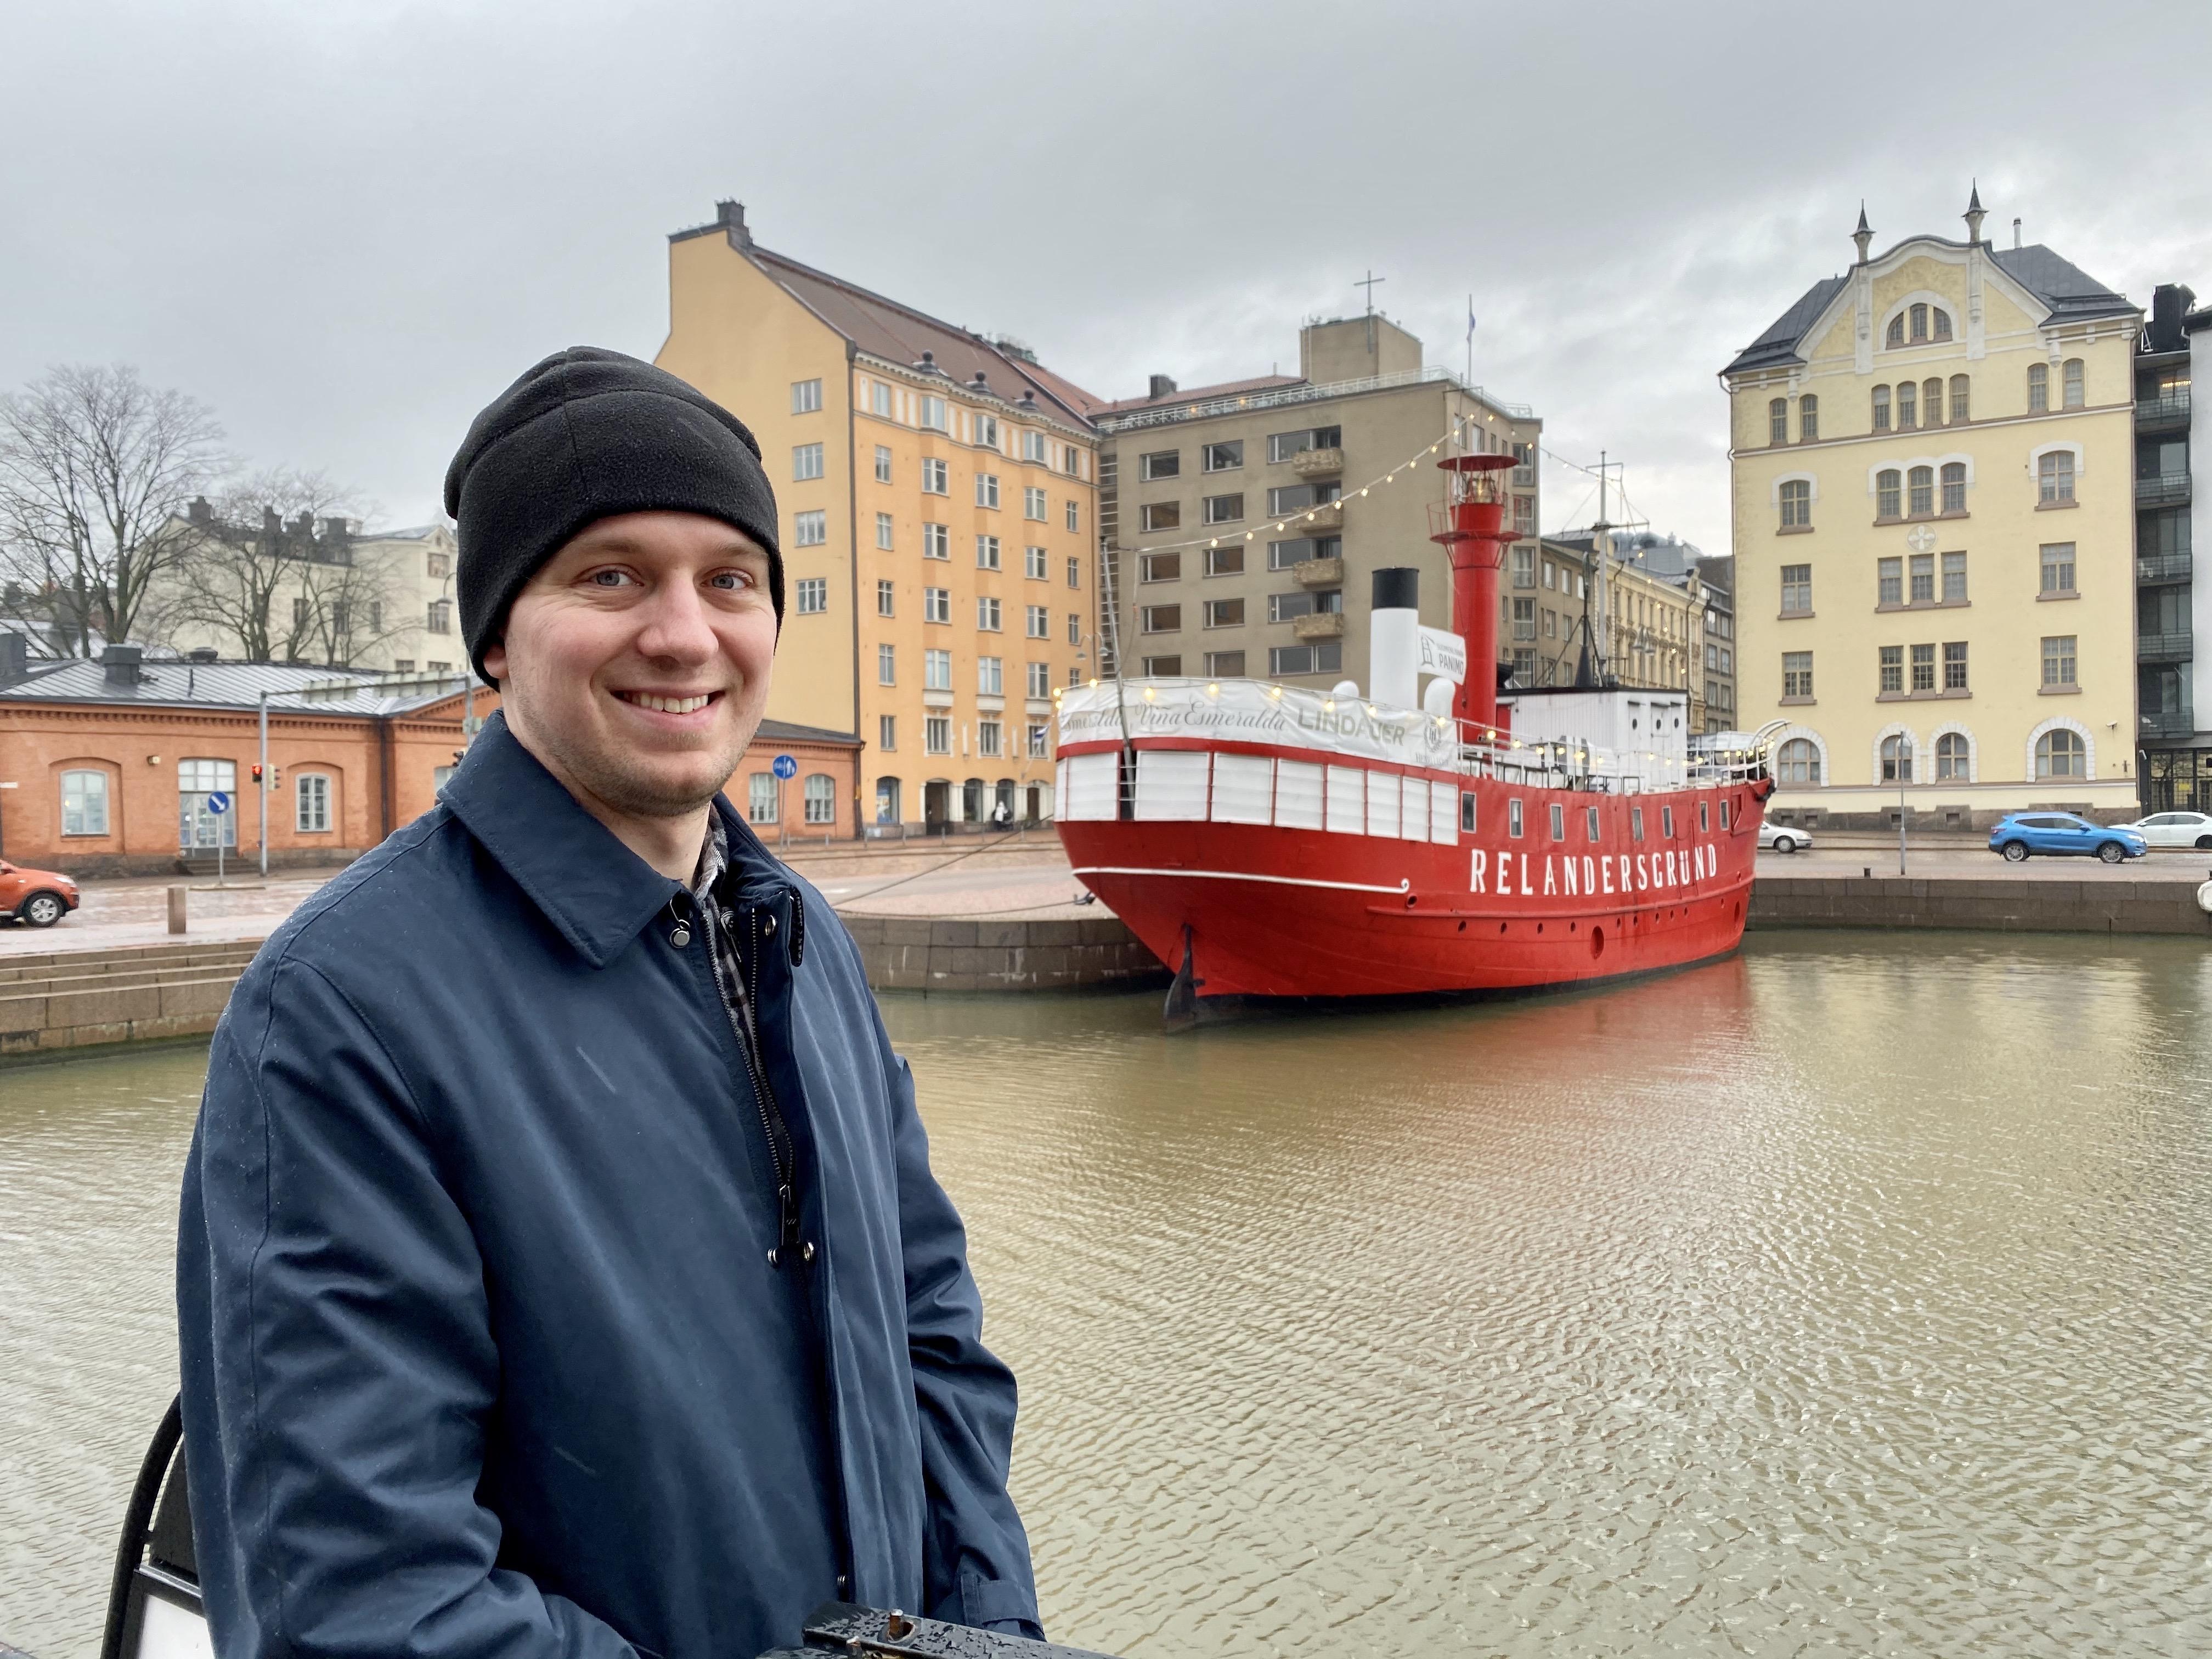 Ben in front of a red boat in Helsinki, Finland.